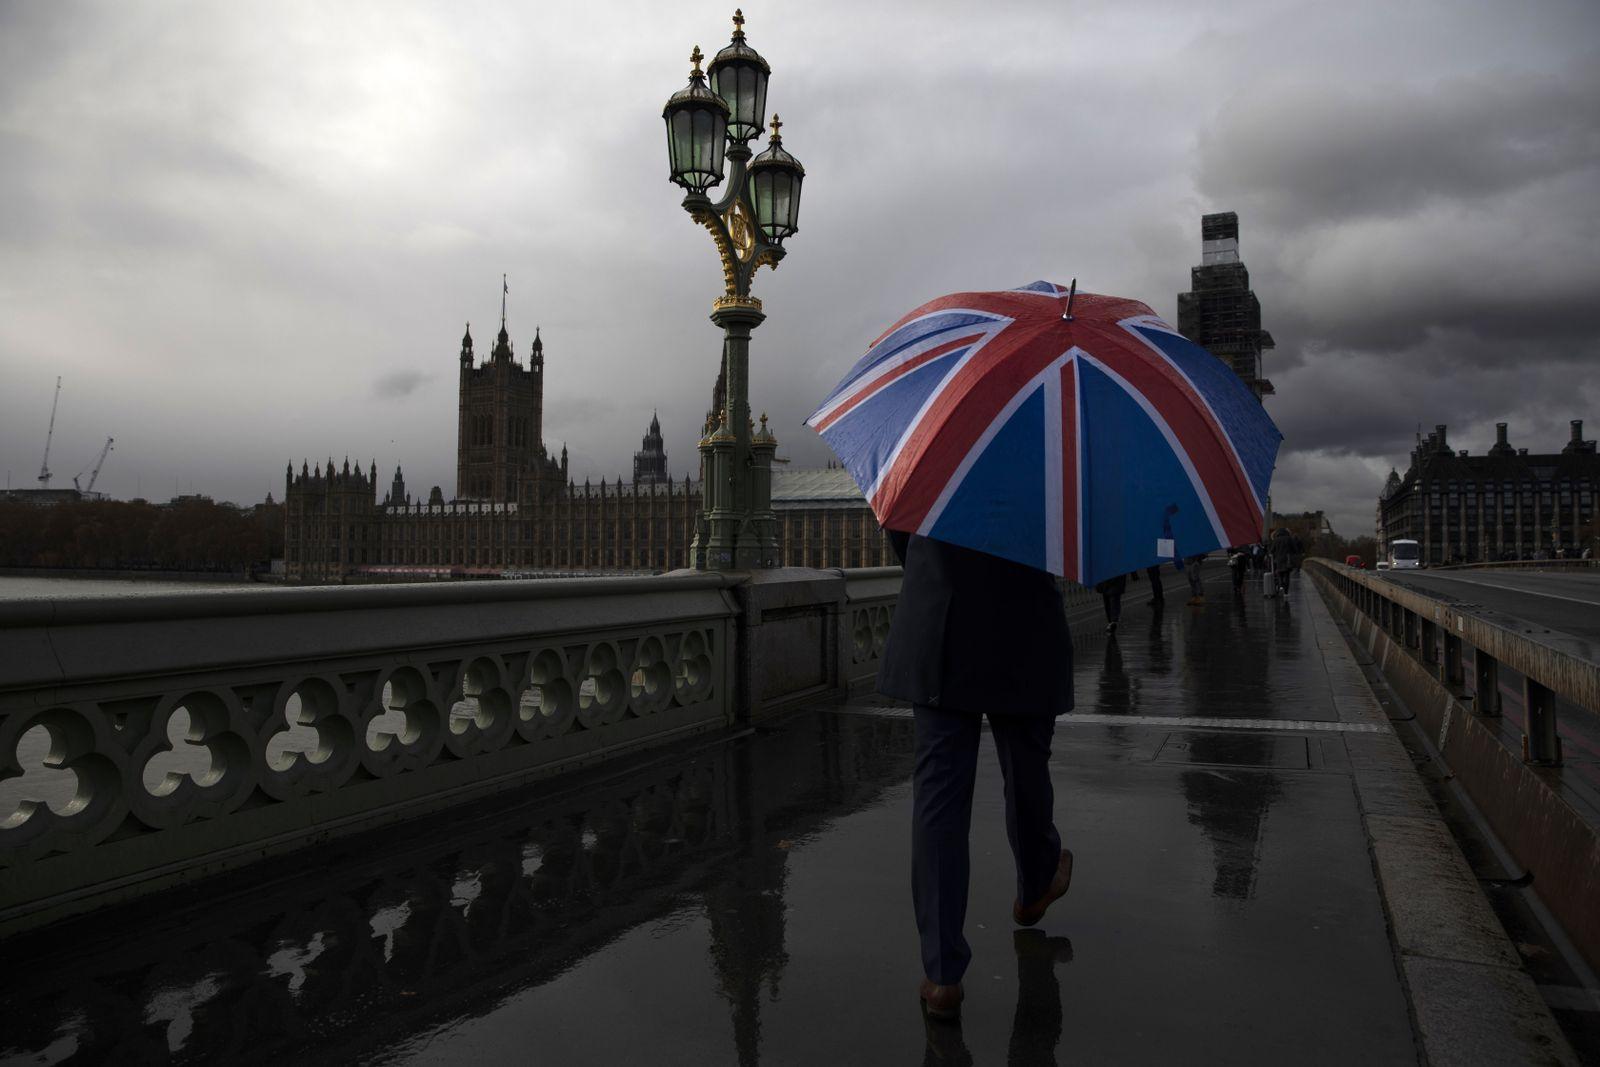 London / Union Jack